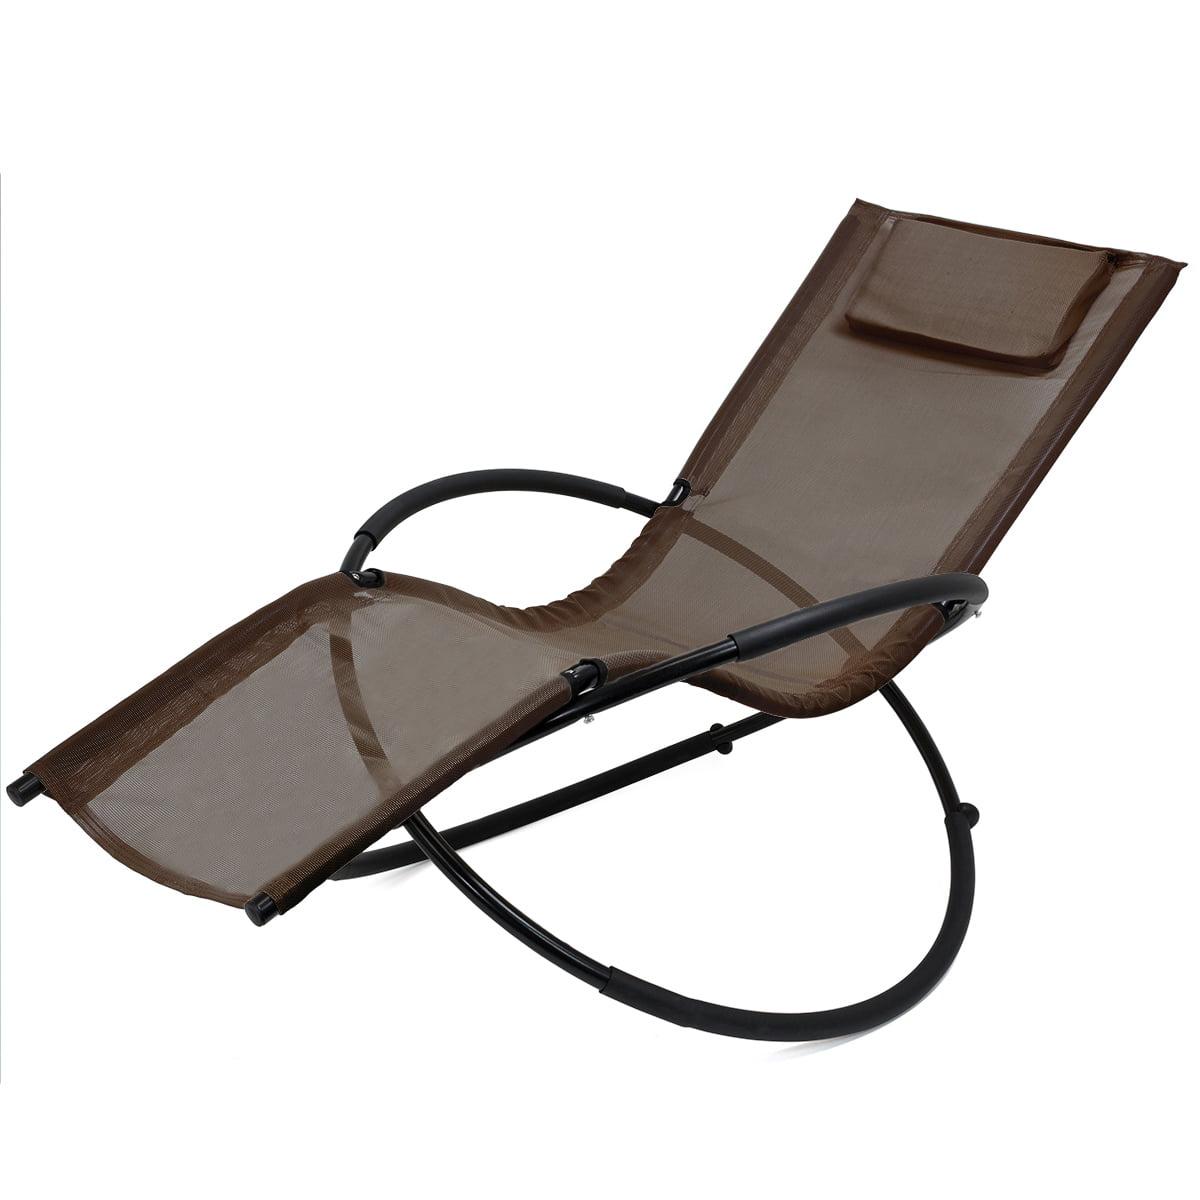 XtremepowerUS Orbital Patio Chair Folding Lounger Rocking Steel Frame, Brown